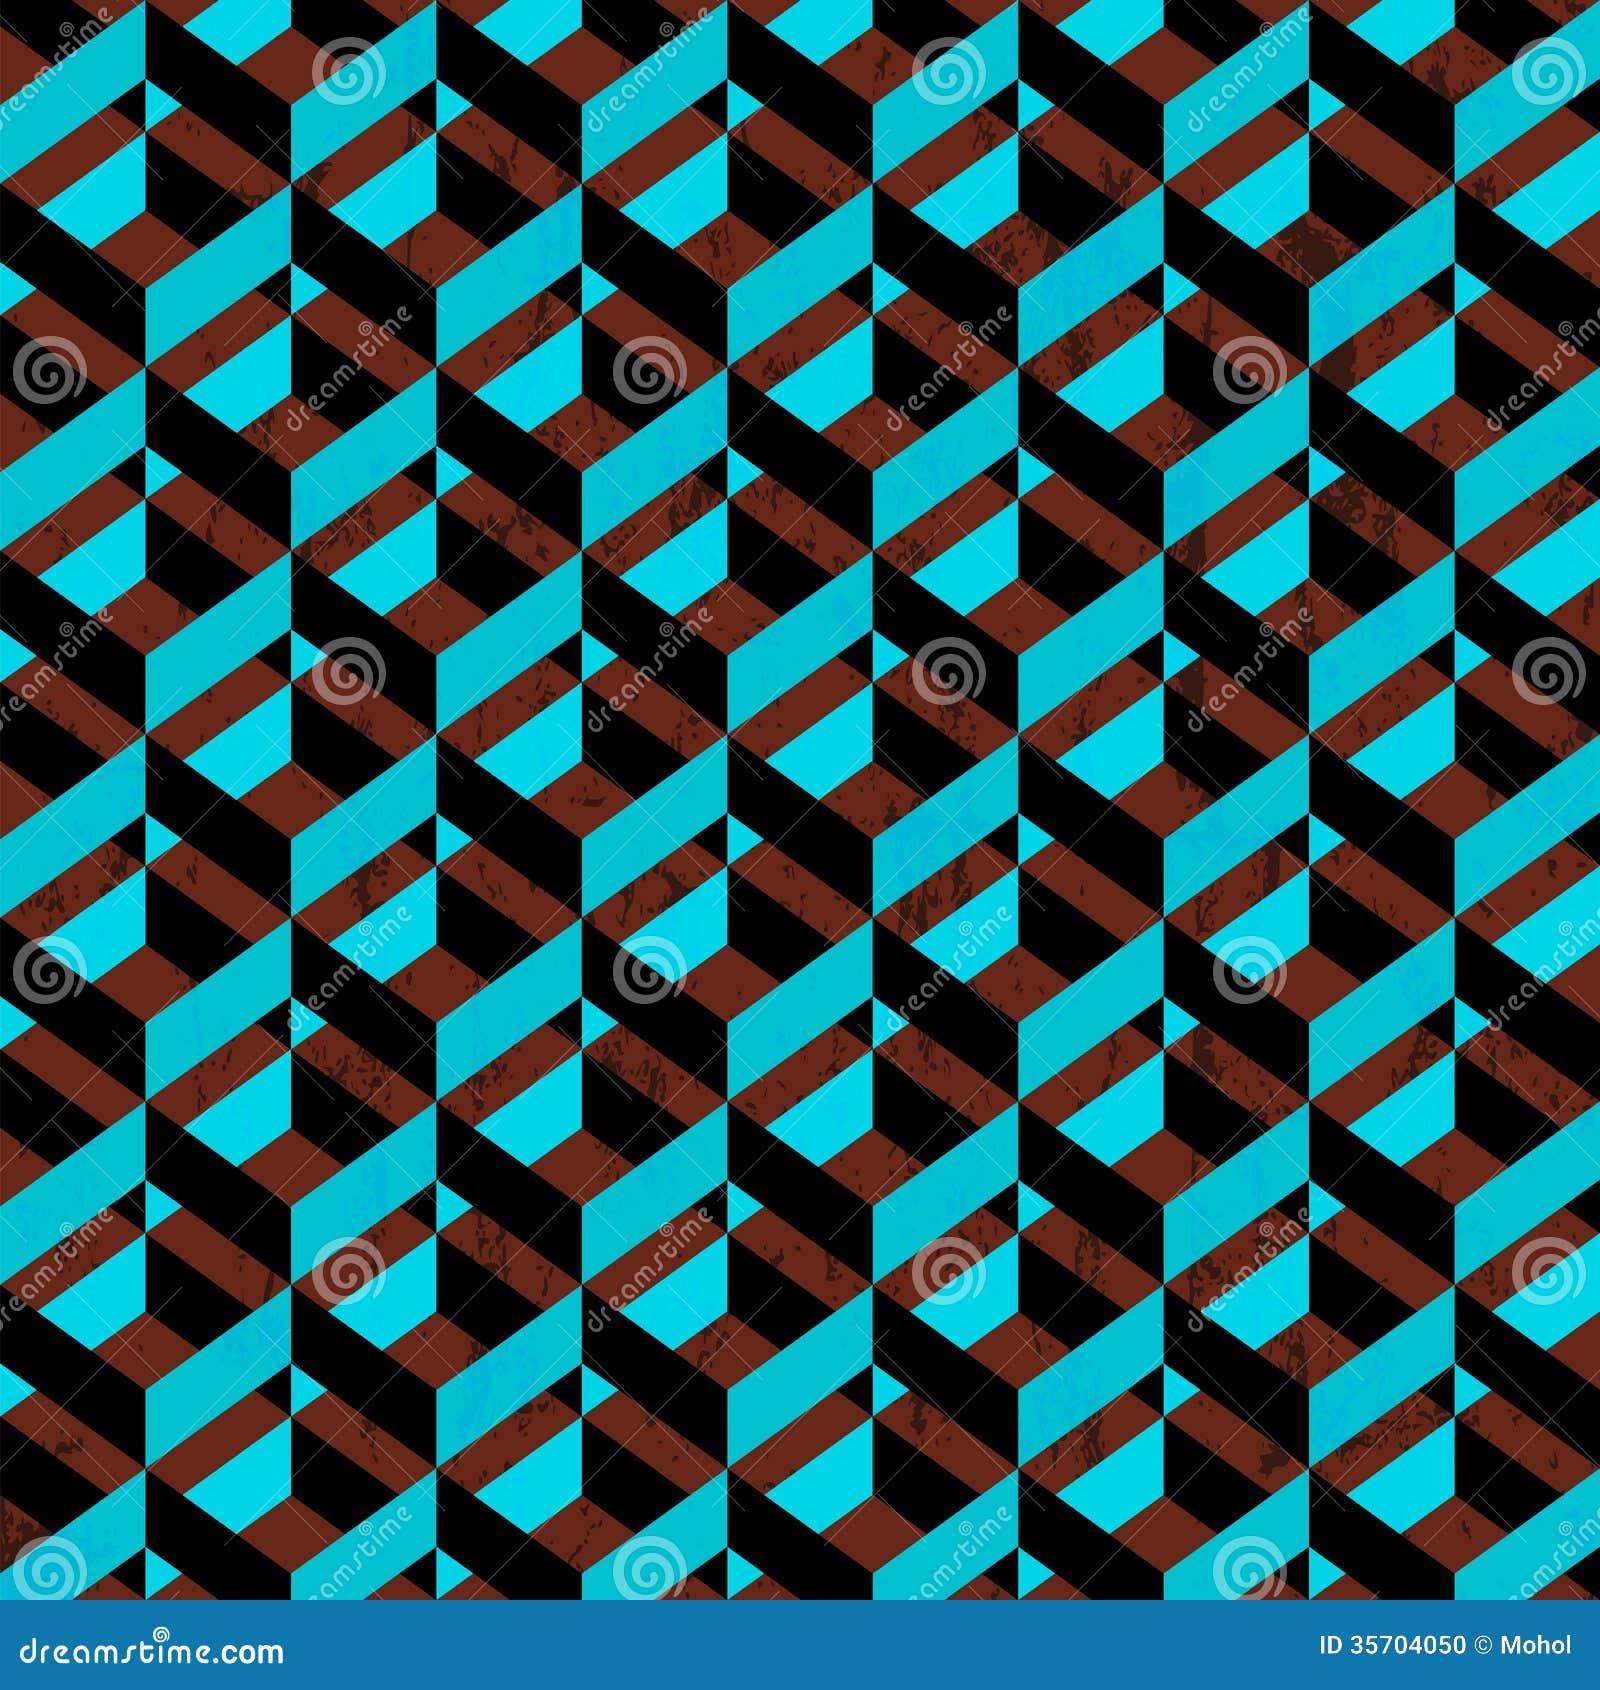 Geometric Pattern Background Stock Photo - Image: 35704050